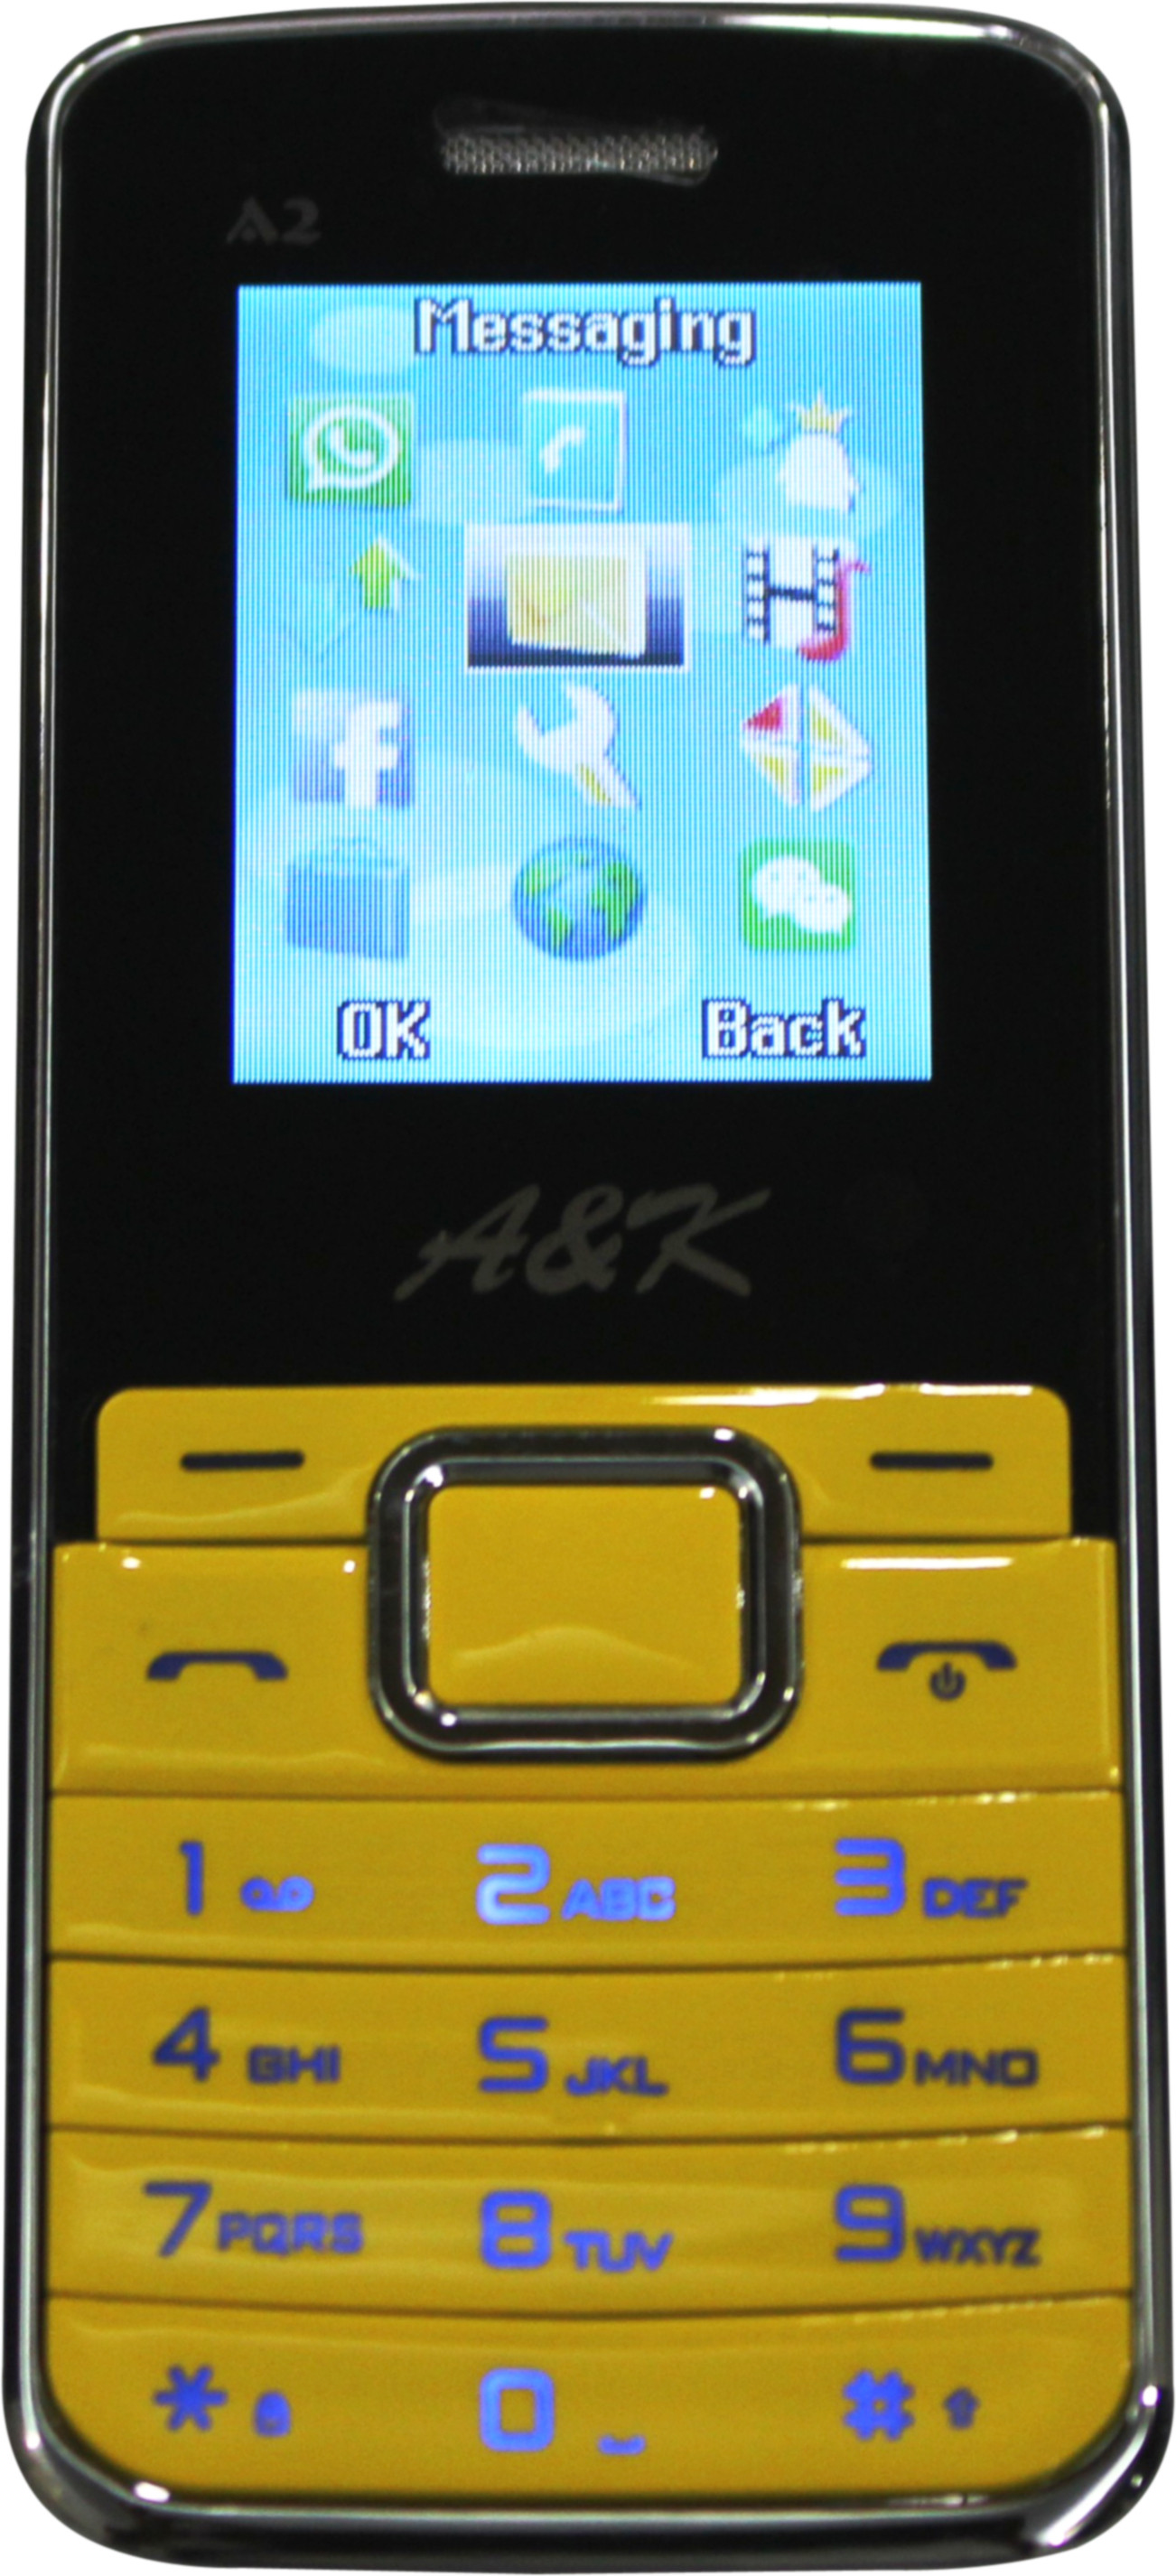 A&K Bar Phone A 2(Yellow, Black)